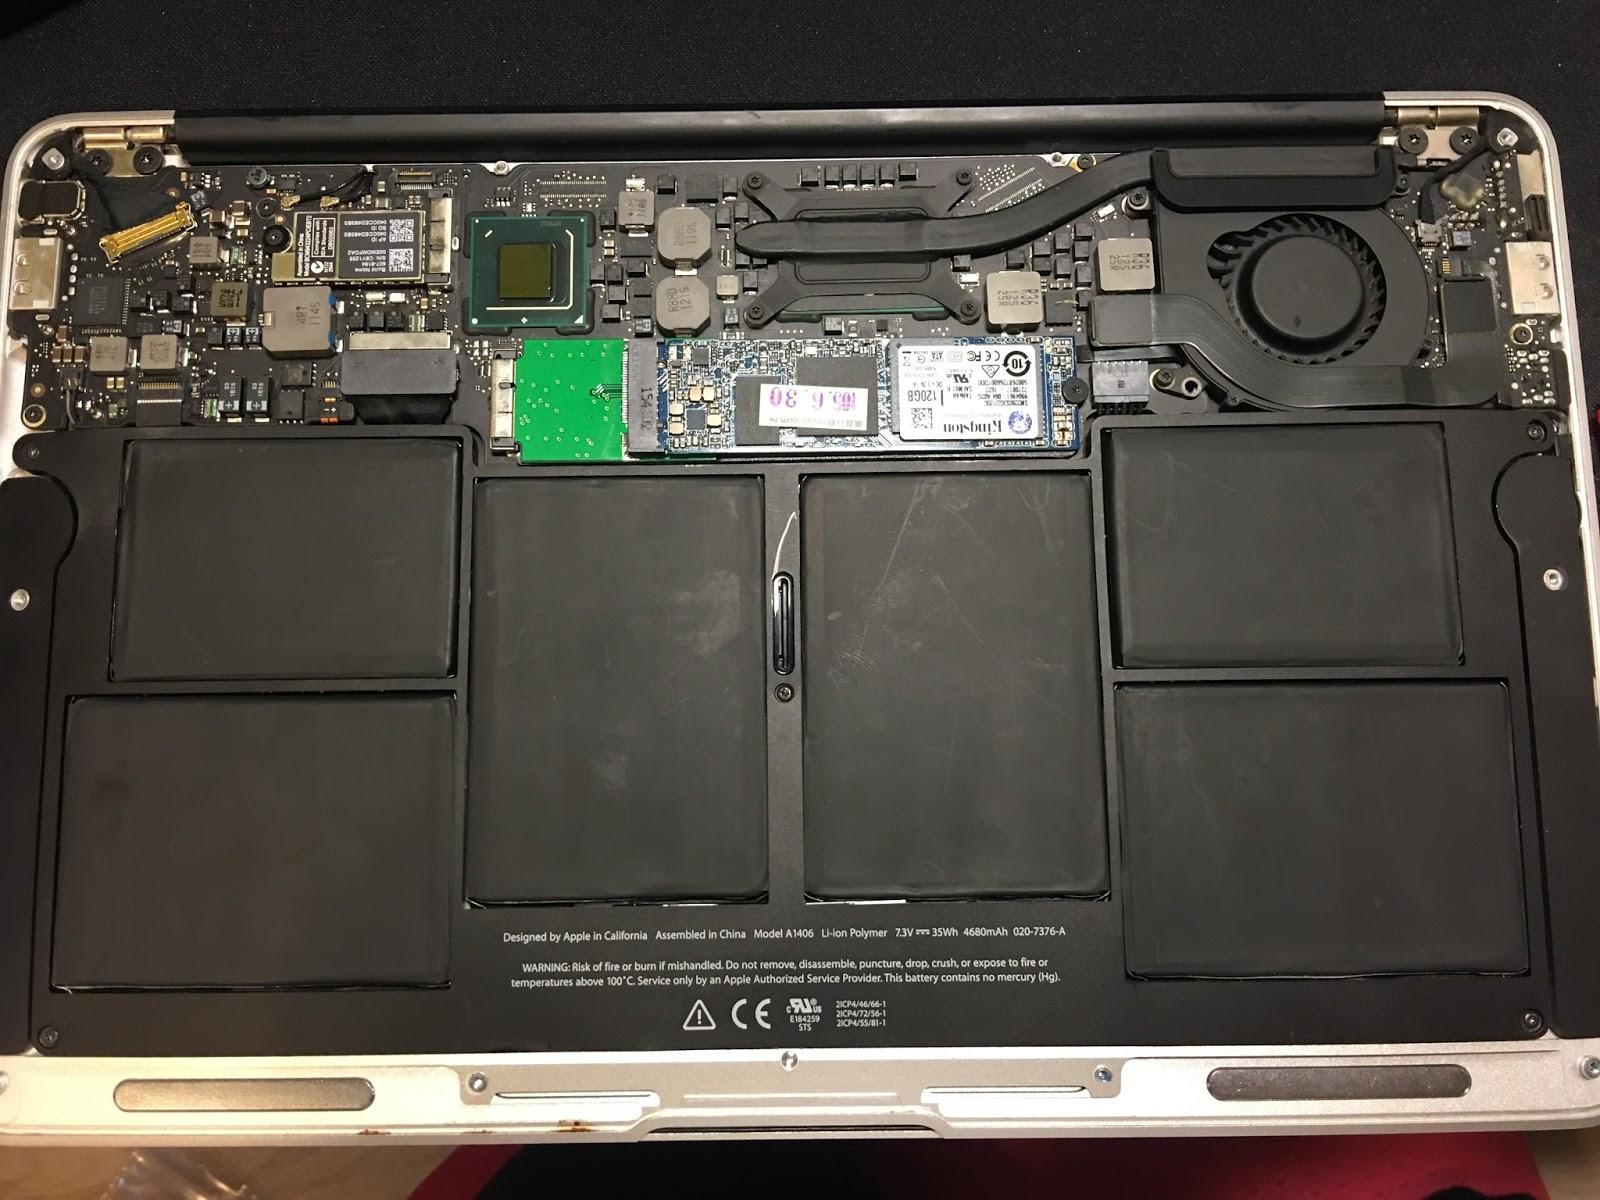 2011 Macbook Air 更換電池 同場加映 升級 SSD - 生命的滋味 - 品嚐烏克麗麗